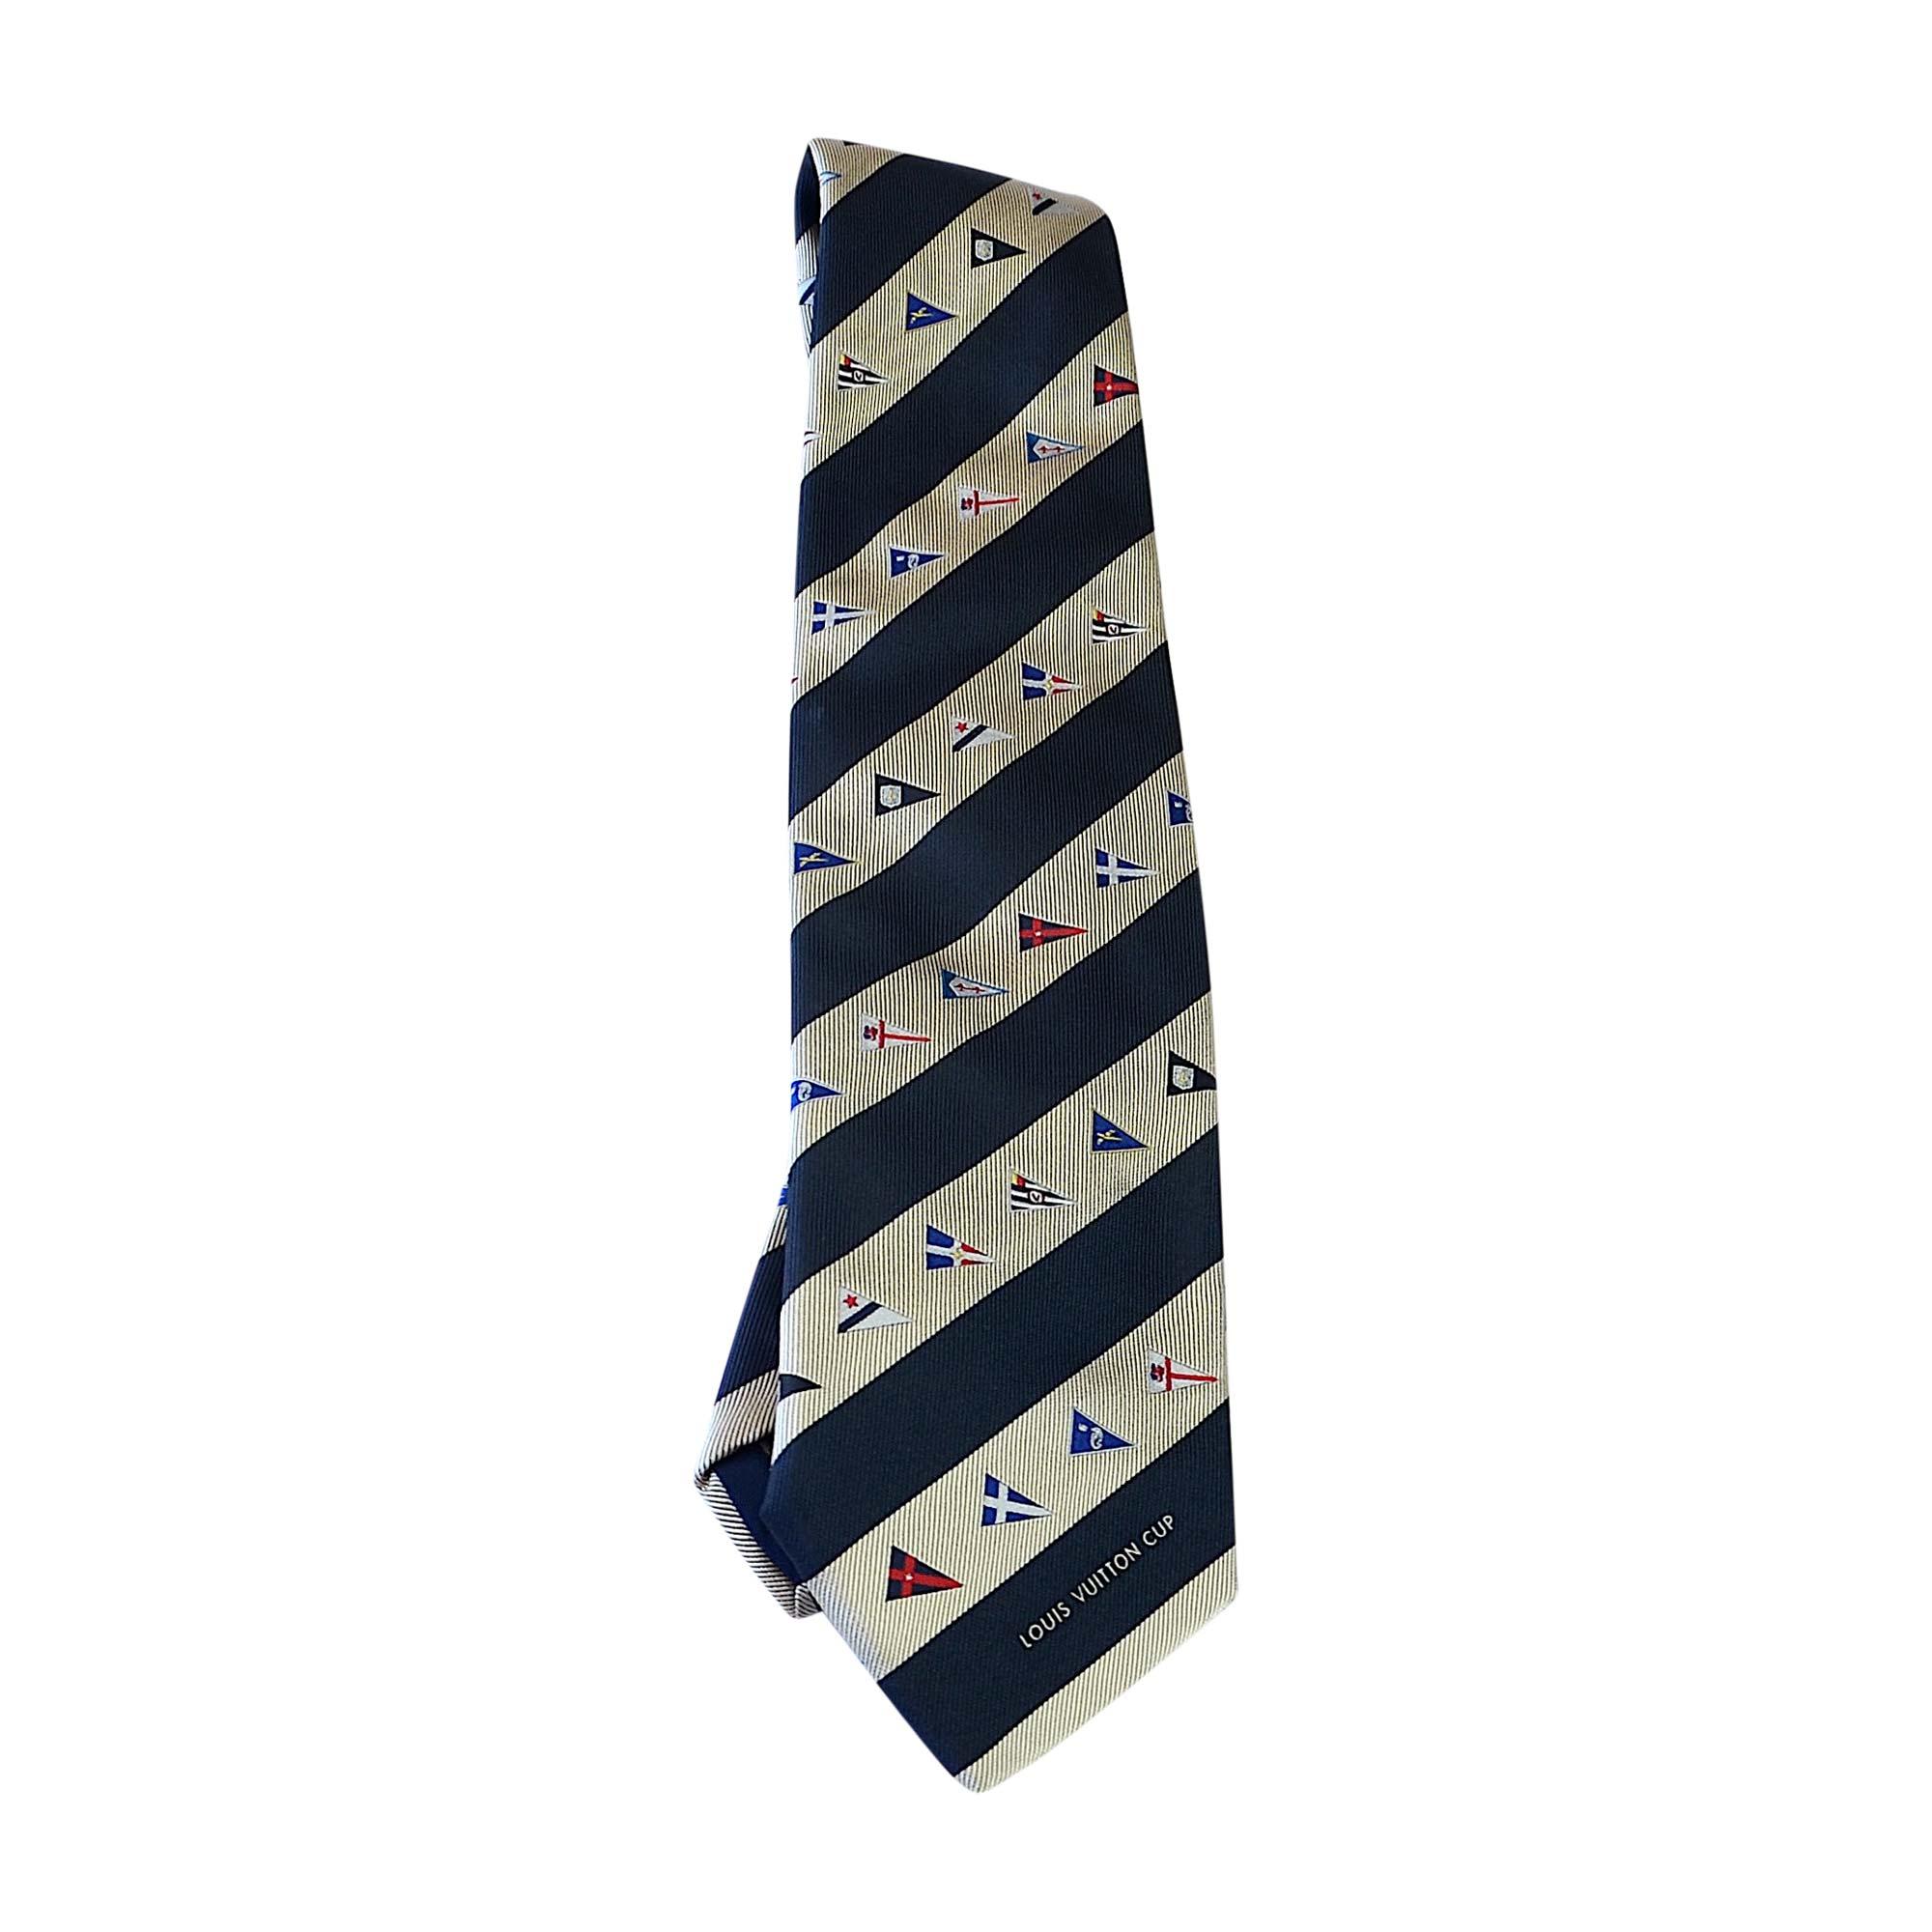 0e2017d53a2d3 Krawatte LOUIS VUITTON mehrfarbig - 7567133